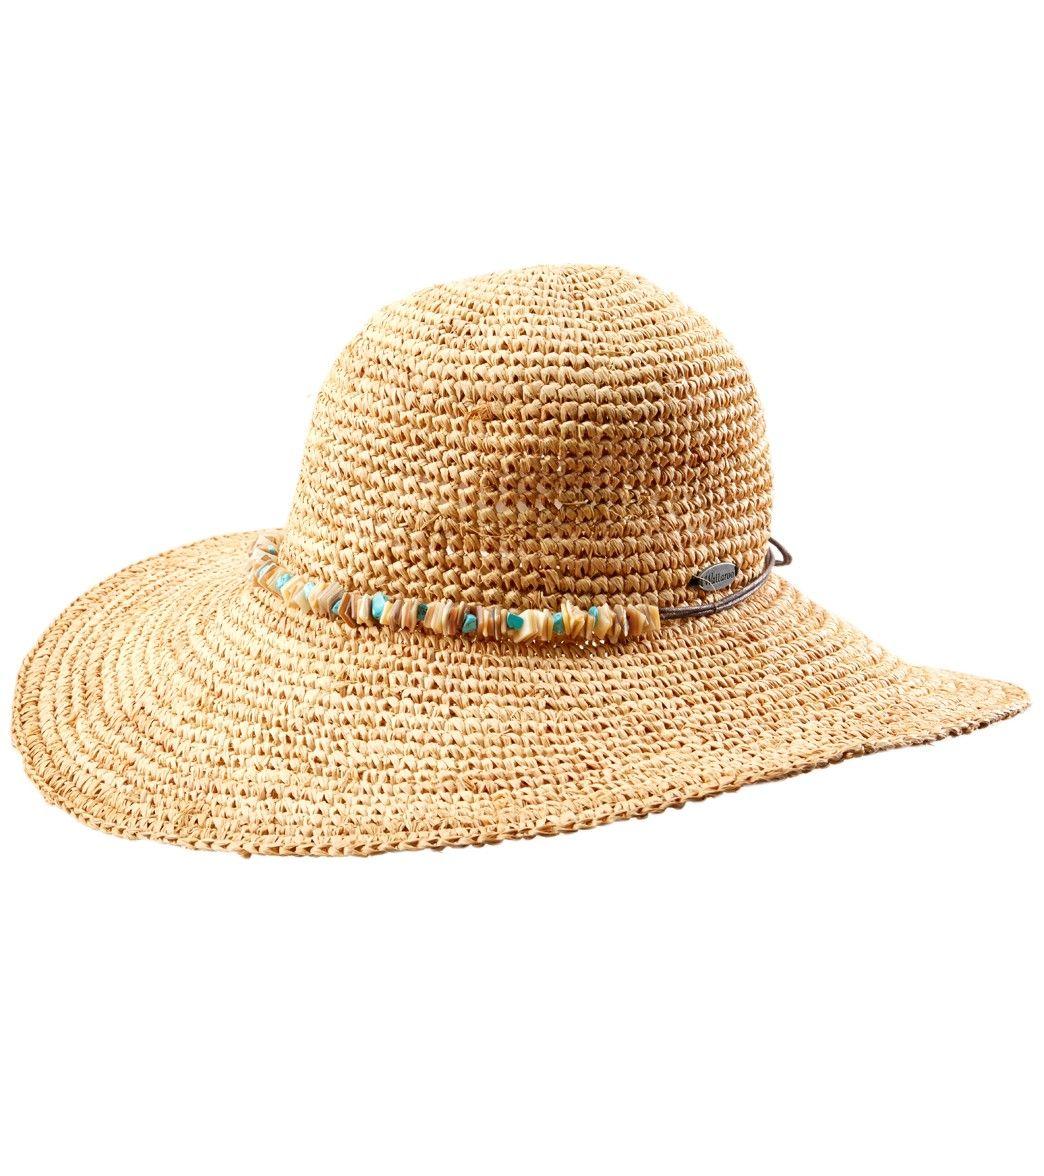 2947a07bc40da Wallaroo Women's Sabrina Sun Hat | Flip Flops, Accessories & Other ...